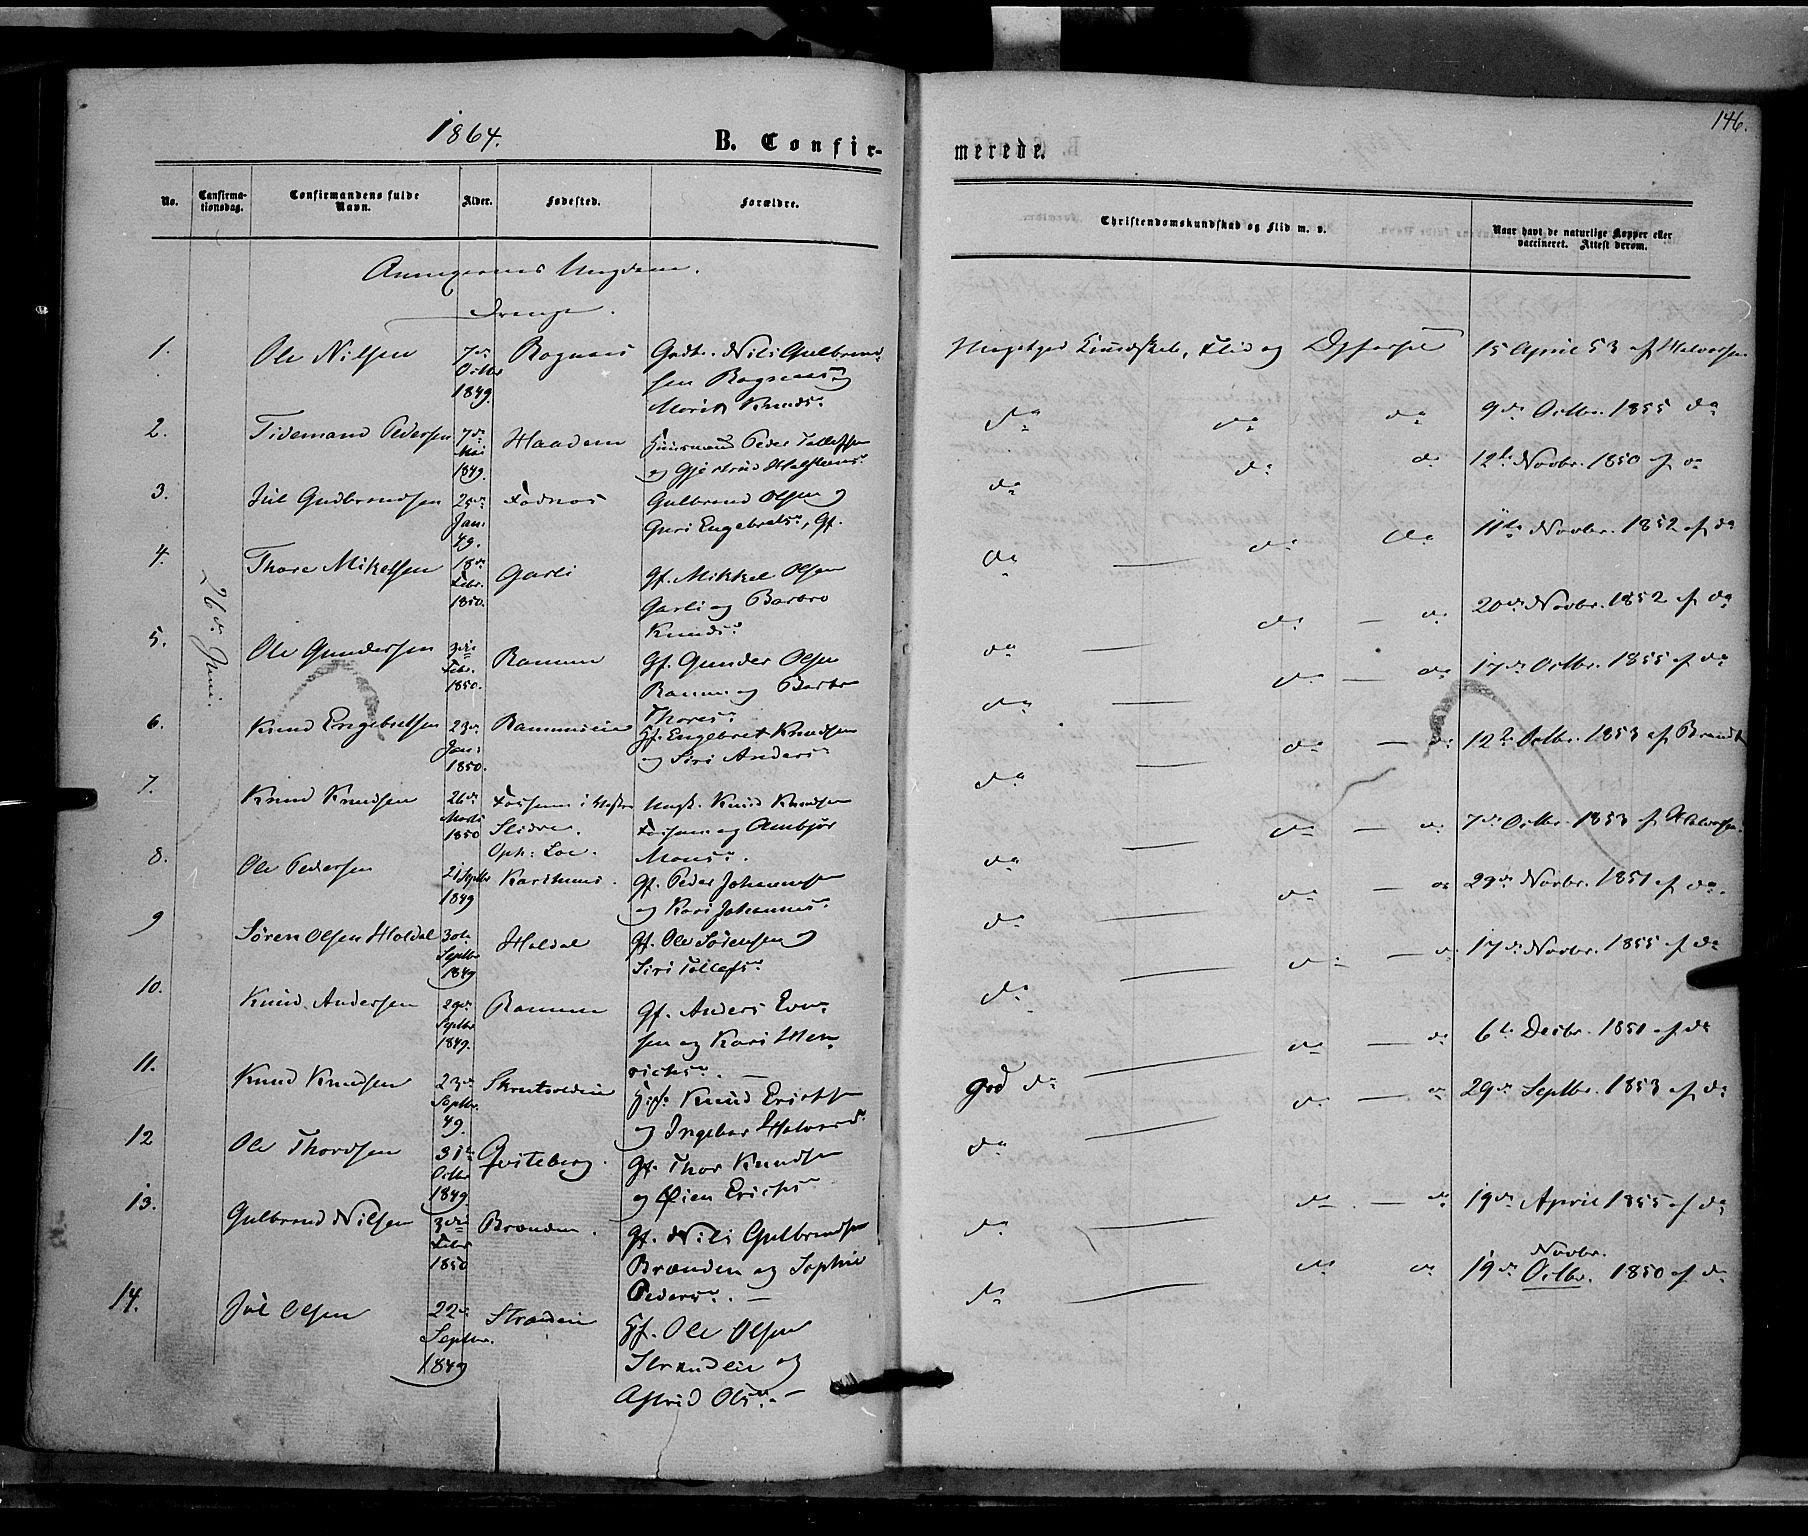 SAH, Nord-Aurdal prestekontor, Ministerialbok nr. 8, 1863-1875, s. 146